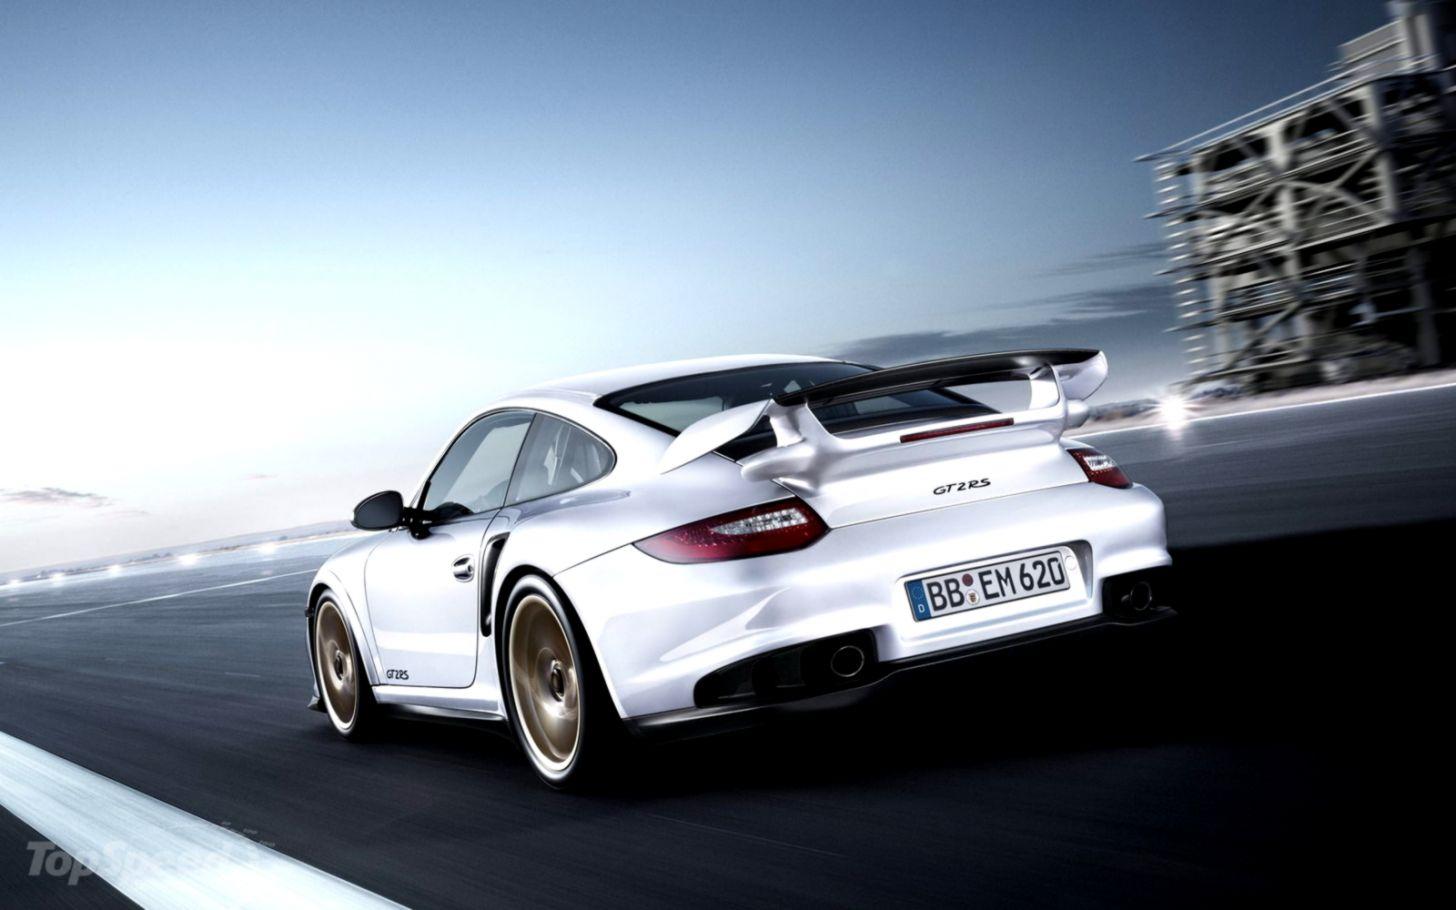 Porsche Gt2 Wallpapers Mega Wallpapers